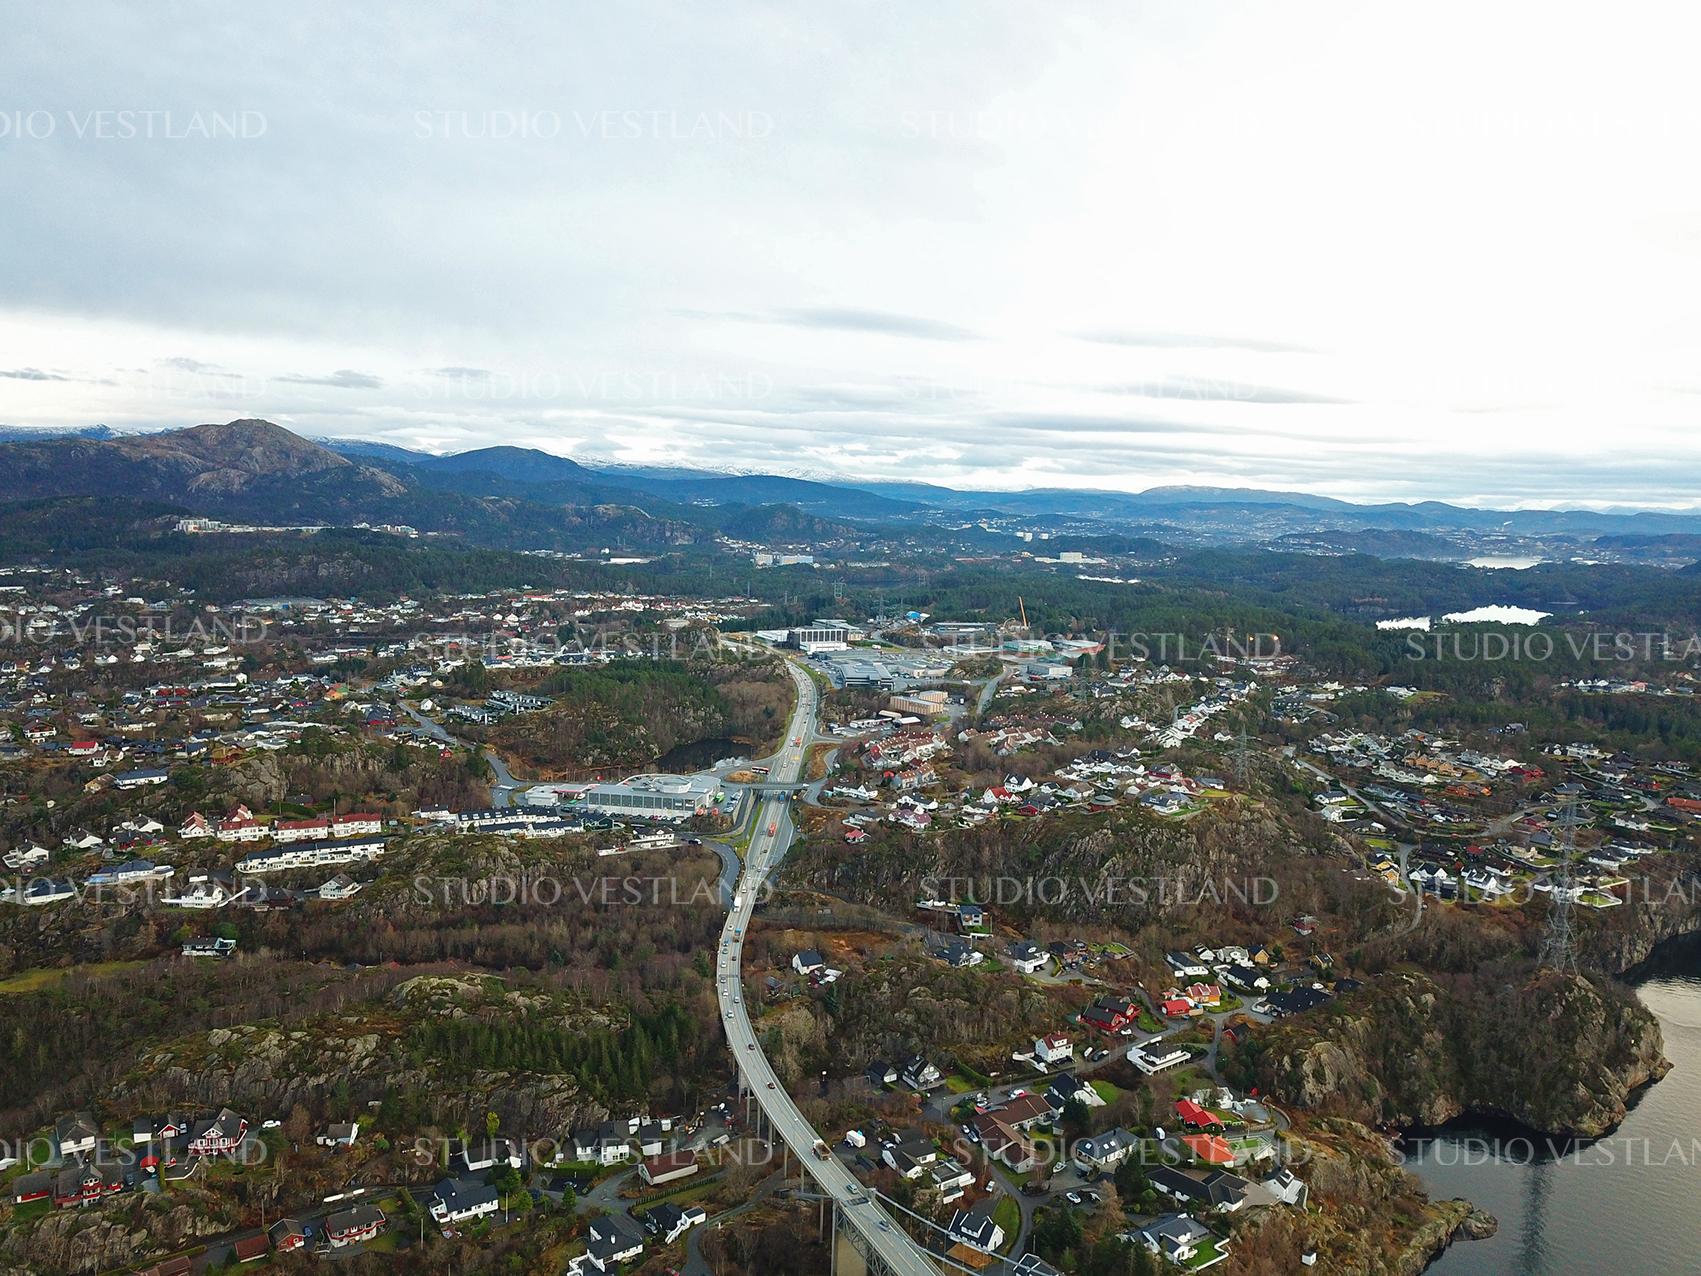 Studio Vestland - Drotningsvik 01